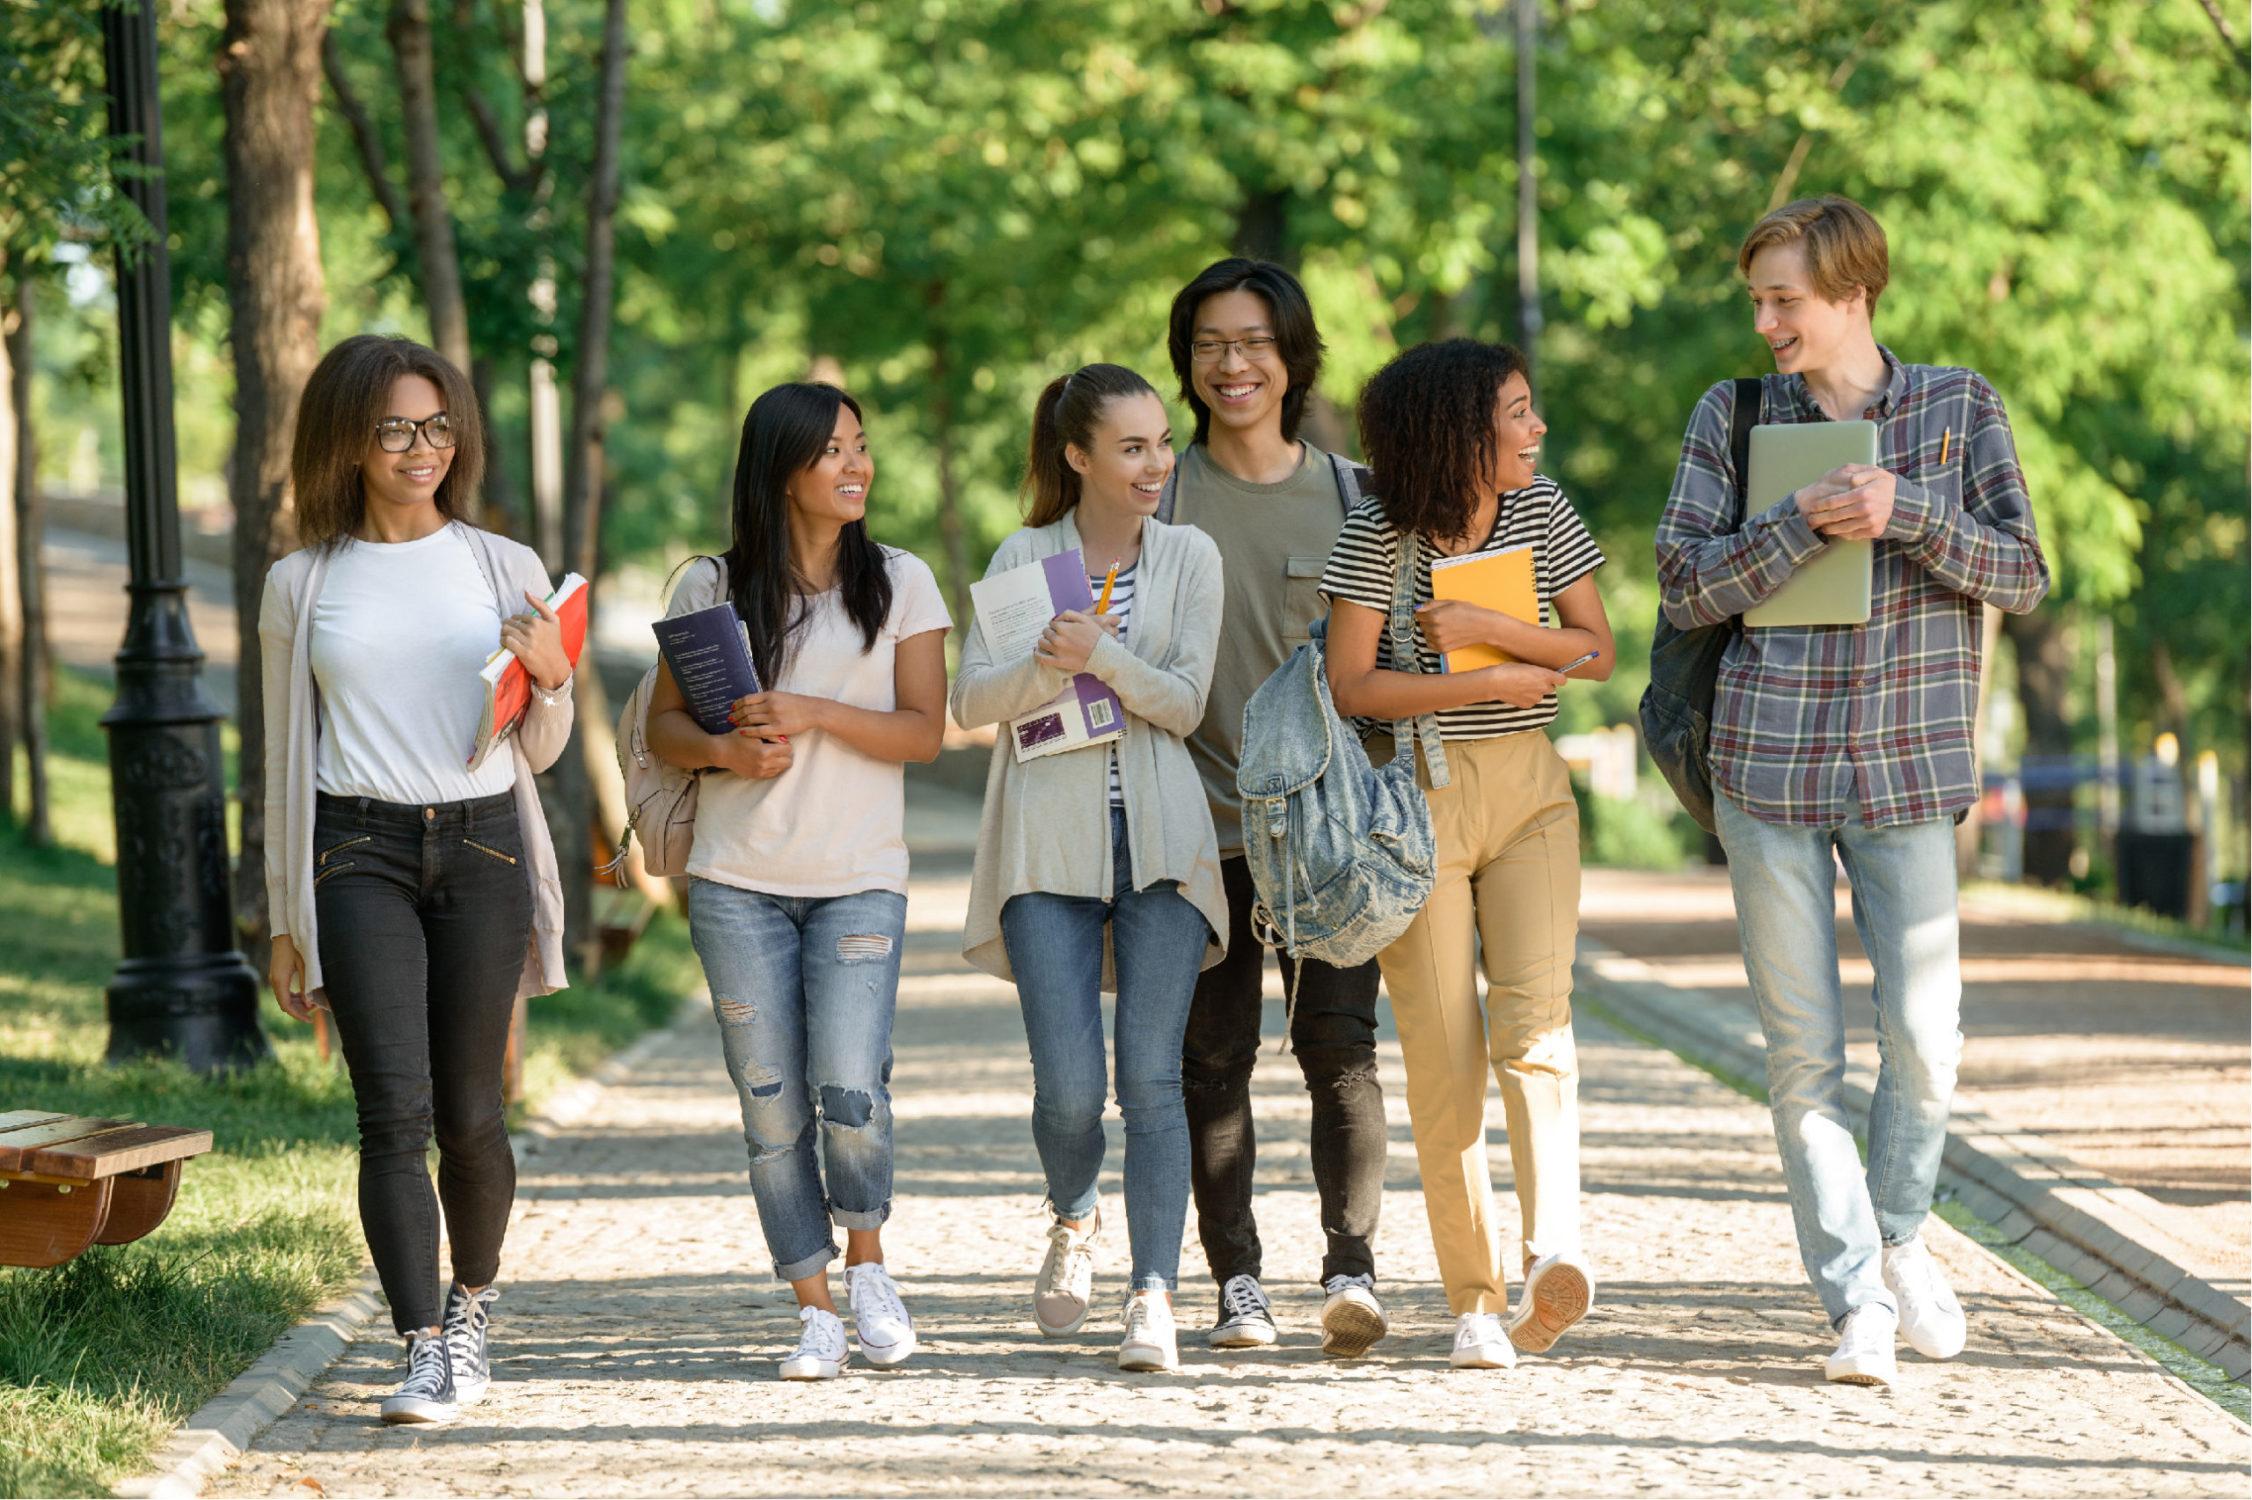 Canada's help towards International Students | April 30, 2020